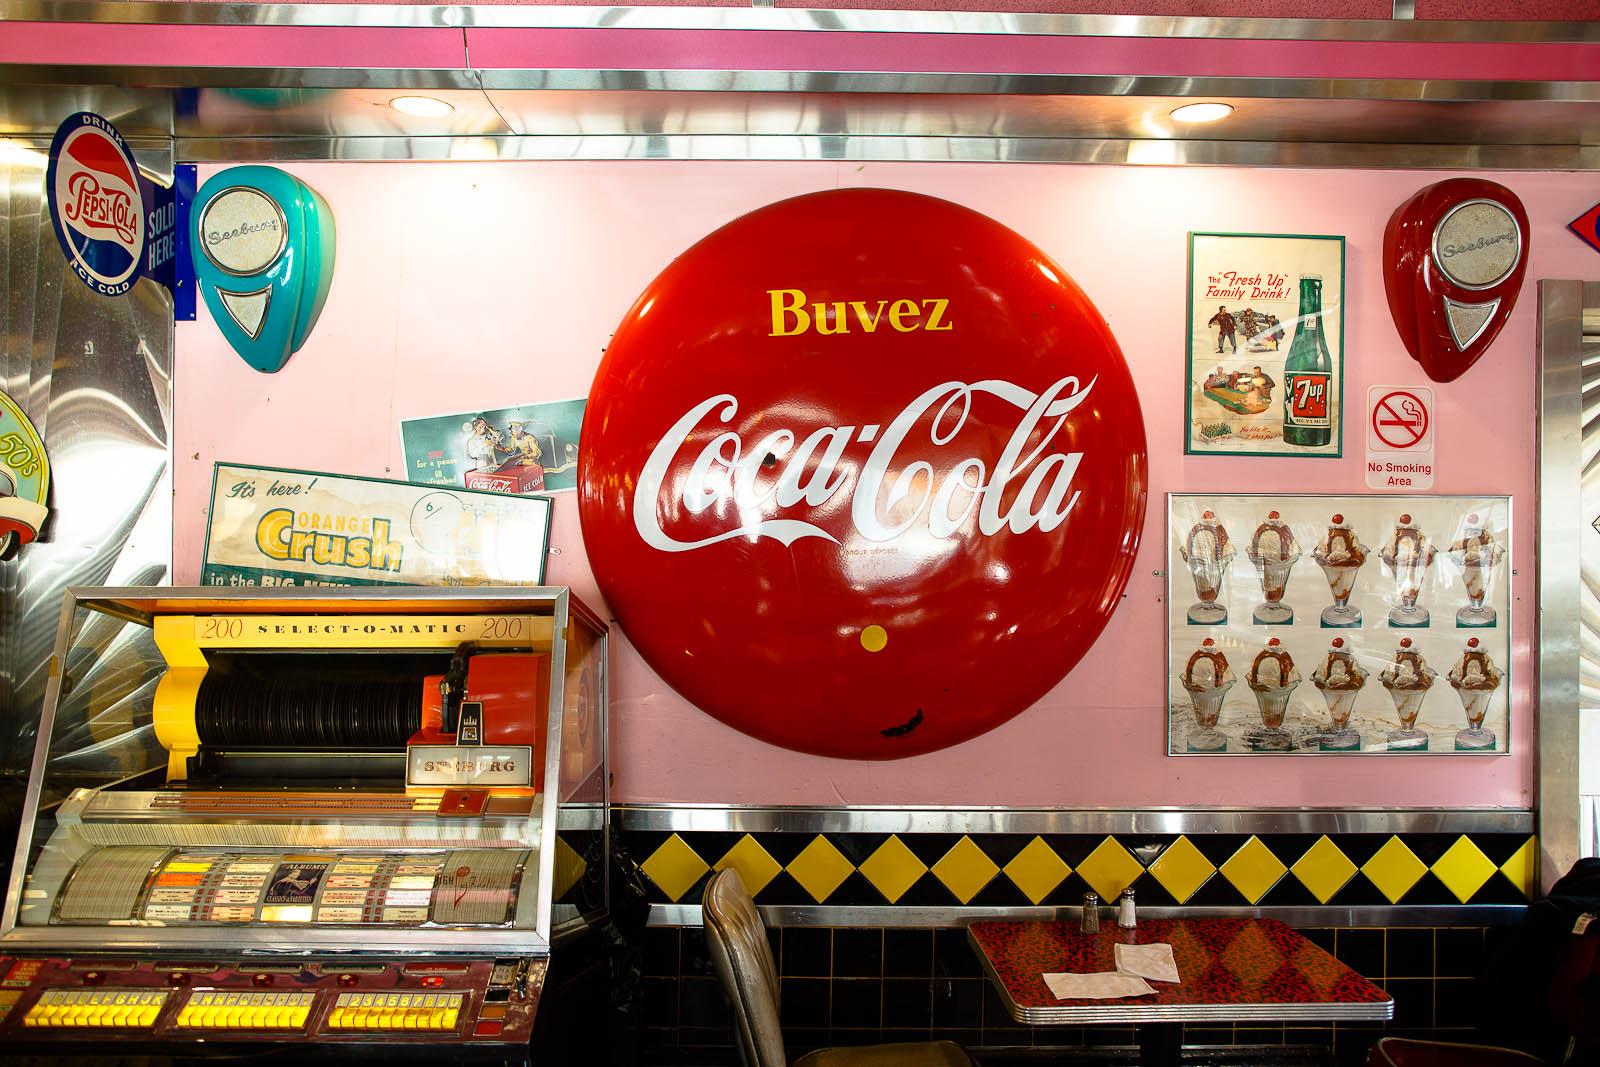 Buvez Coca Cola